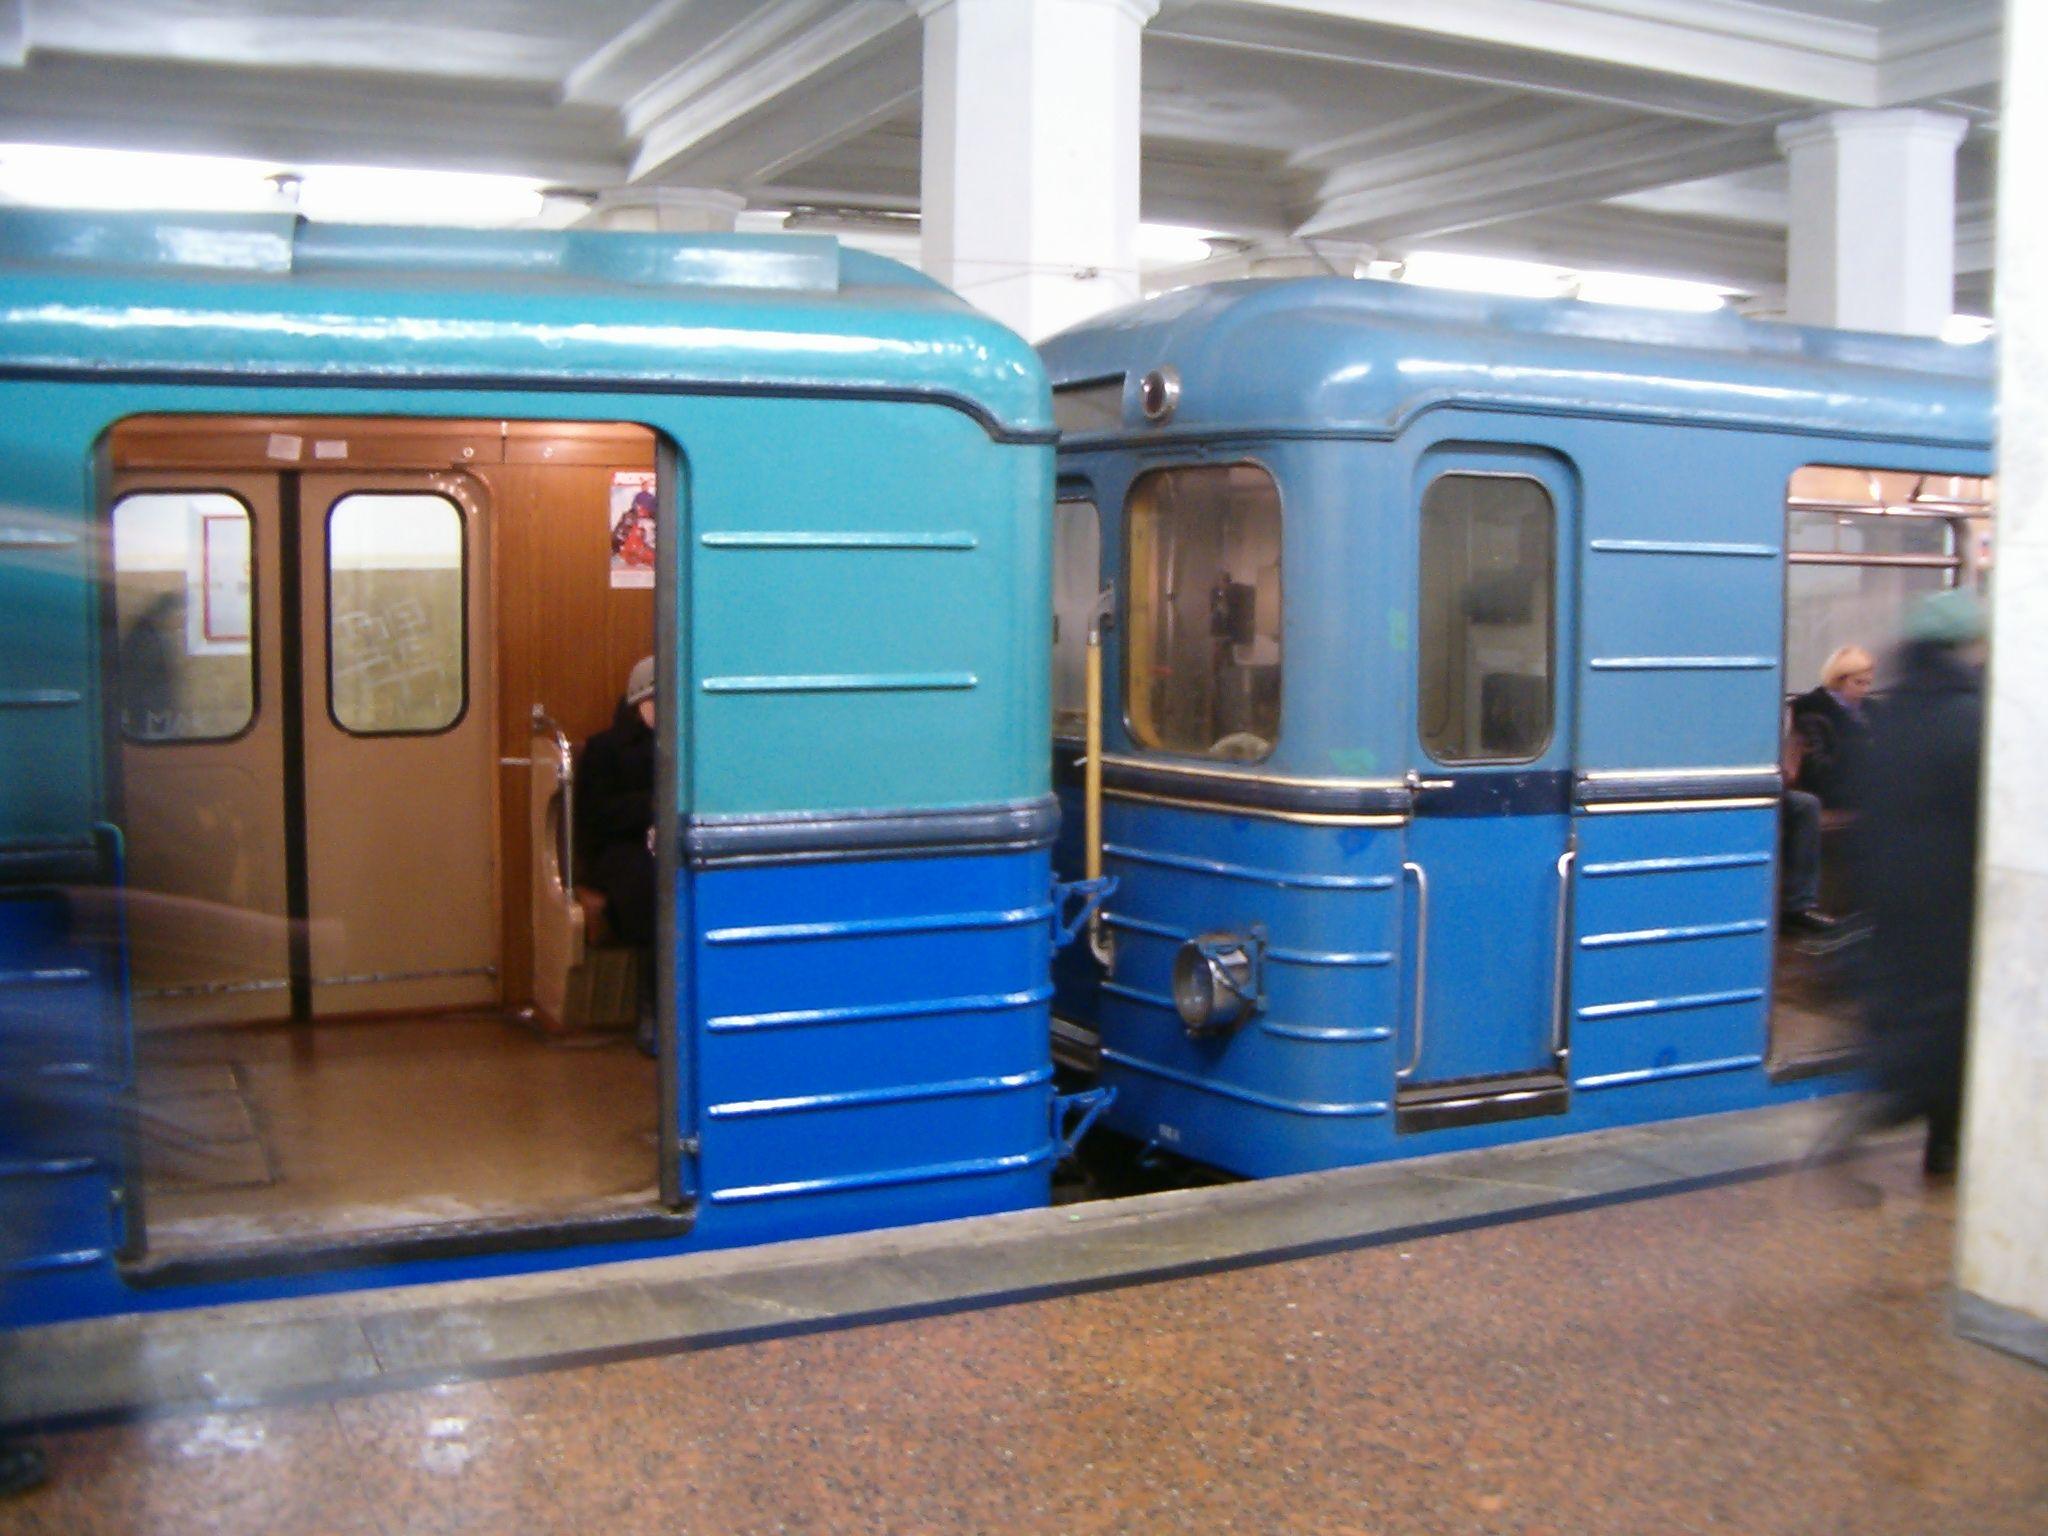 e_metro_ablak.jpg